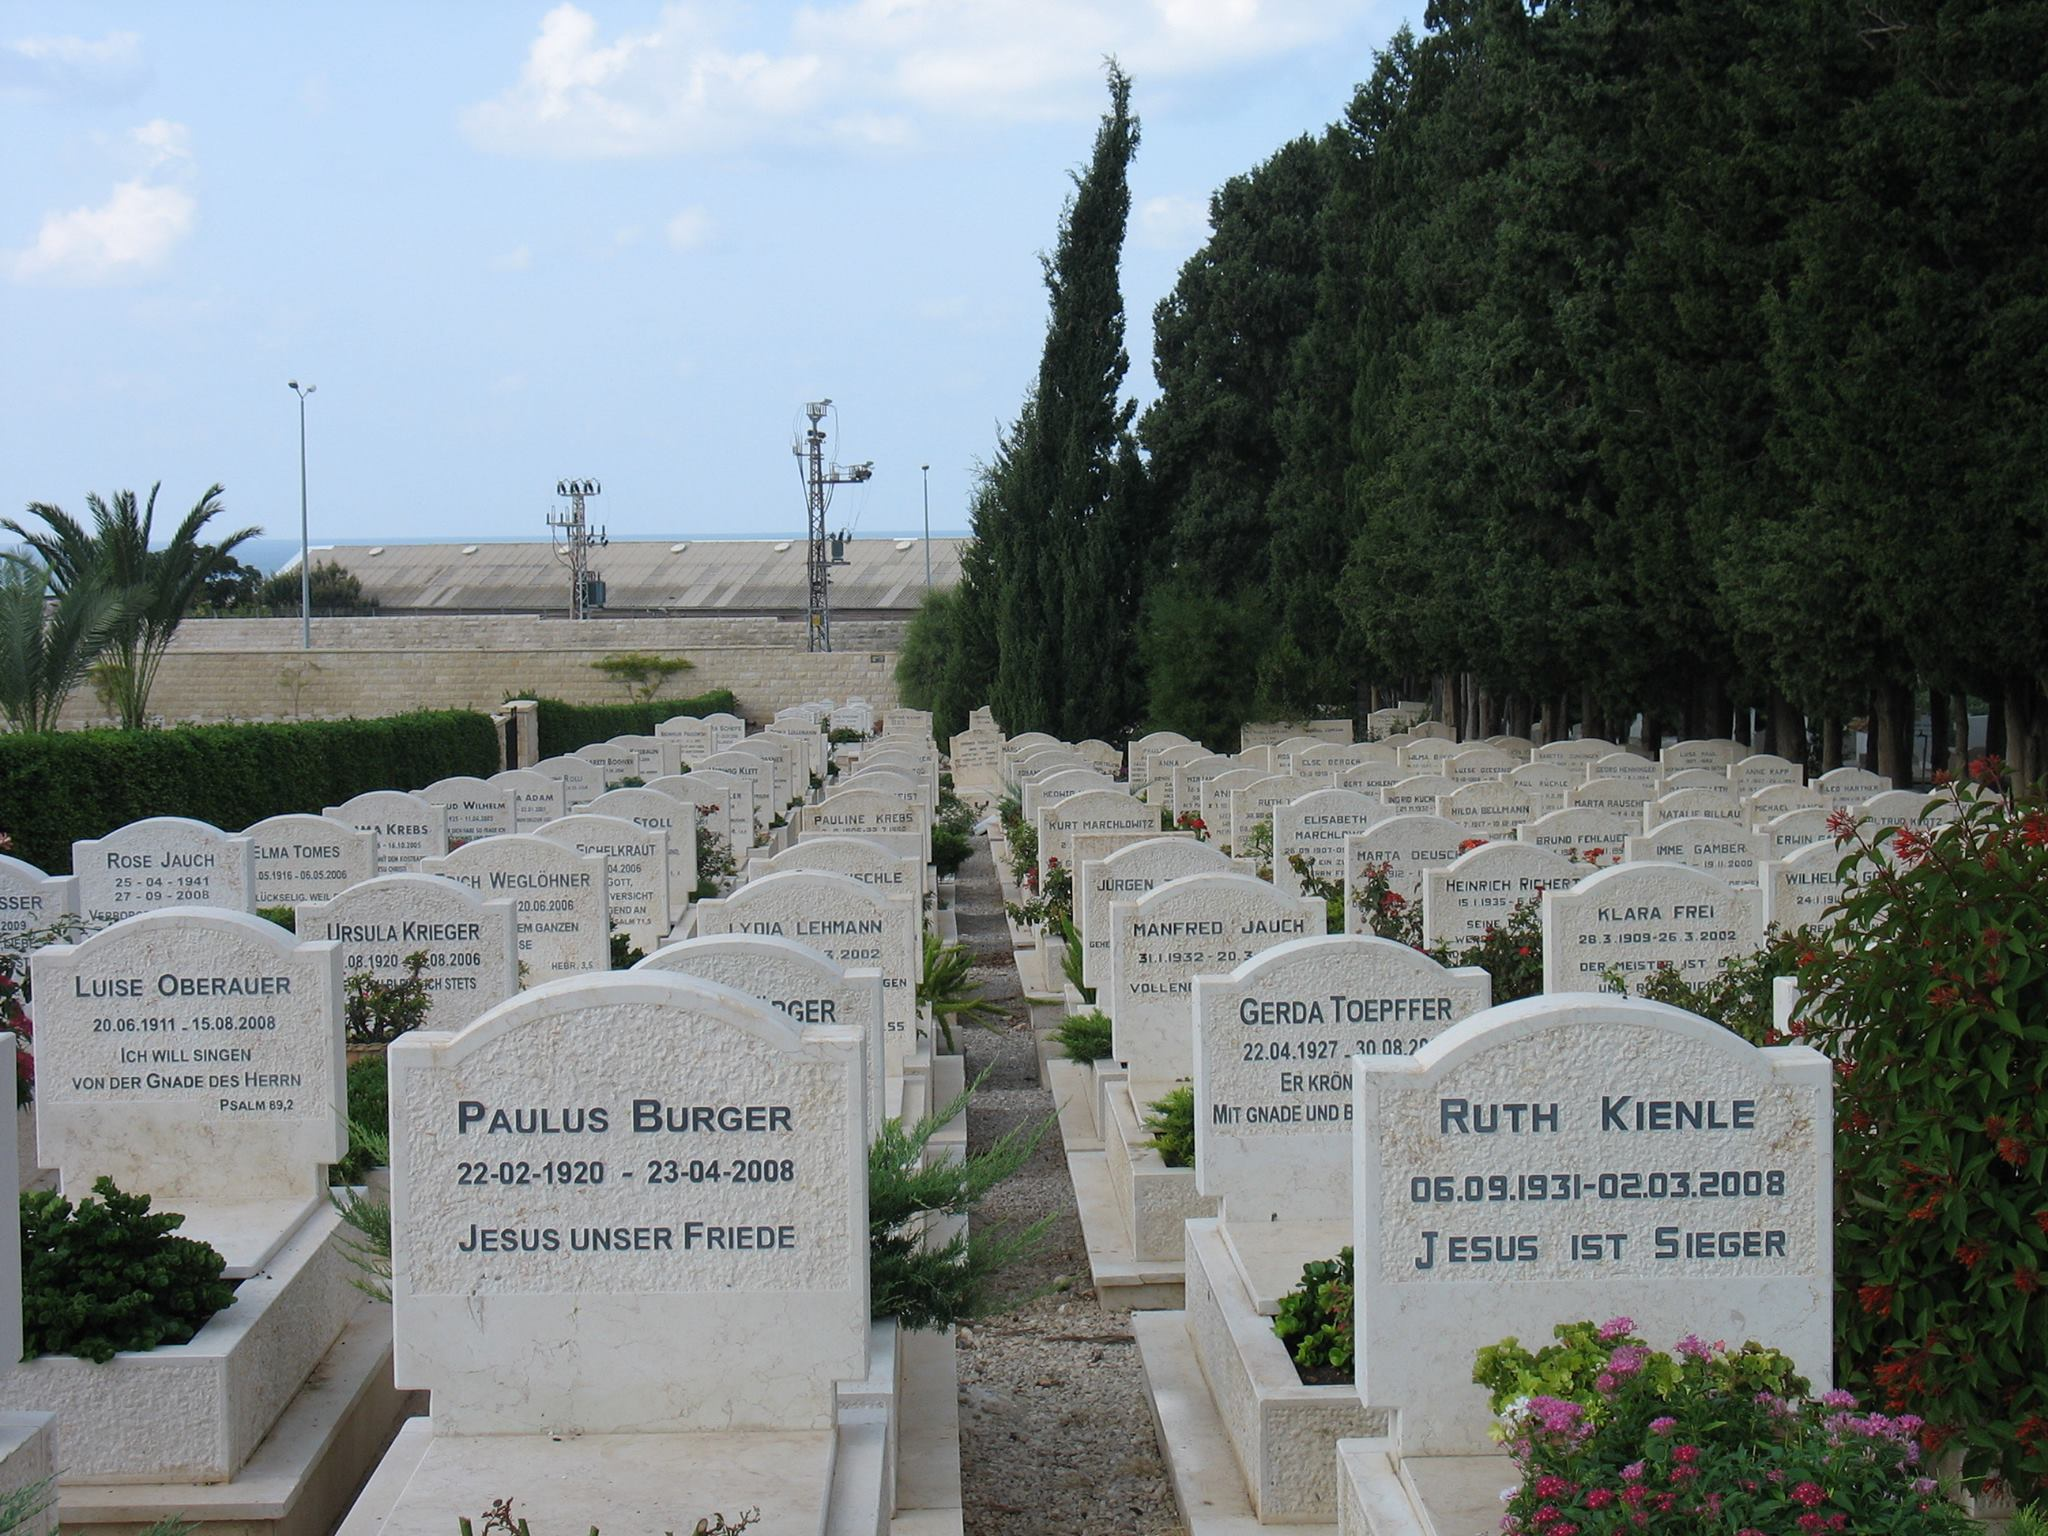 keresztyen temeto izraelben